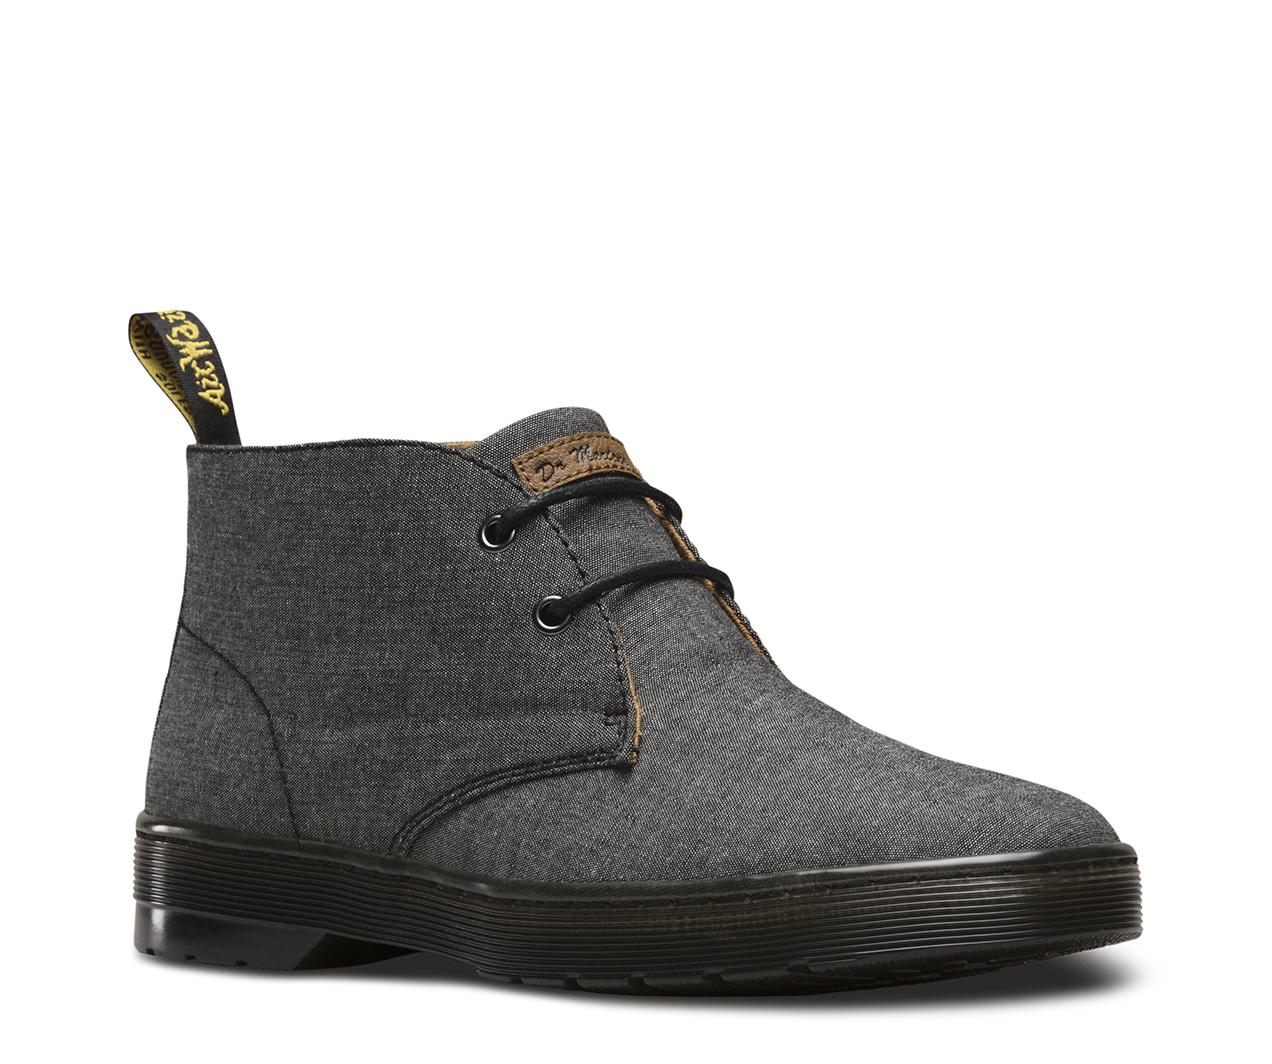 Men's Chukka Boots | Official Dr. Martens Store